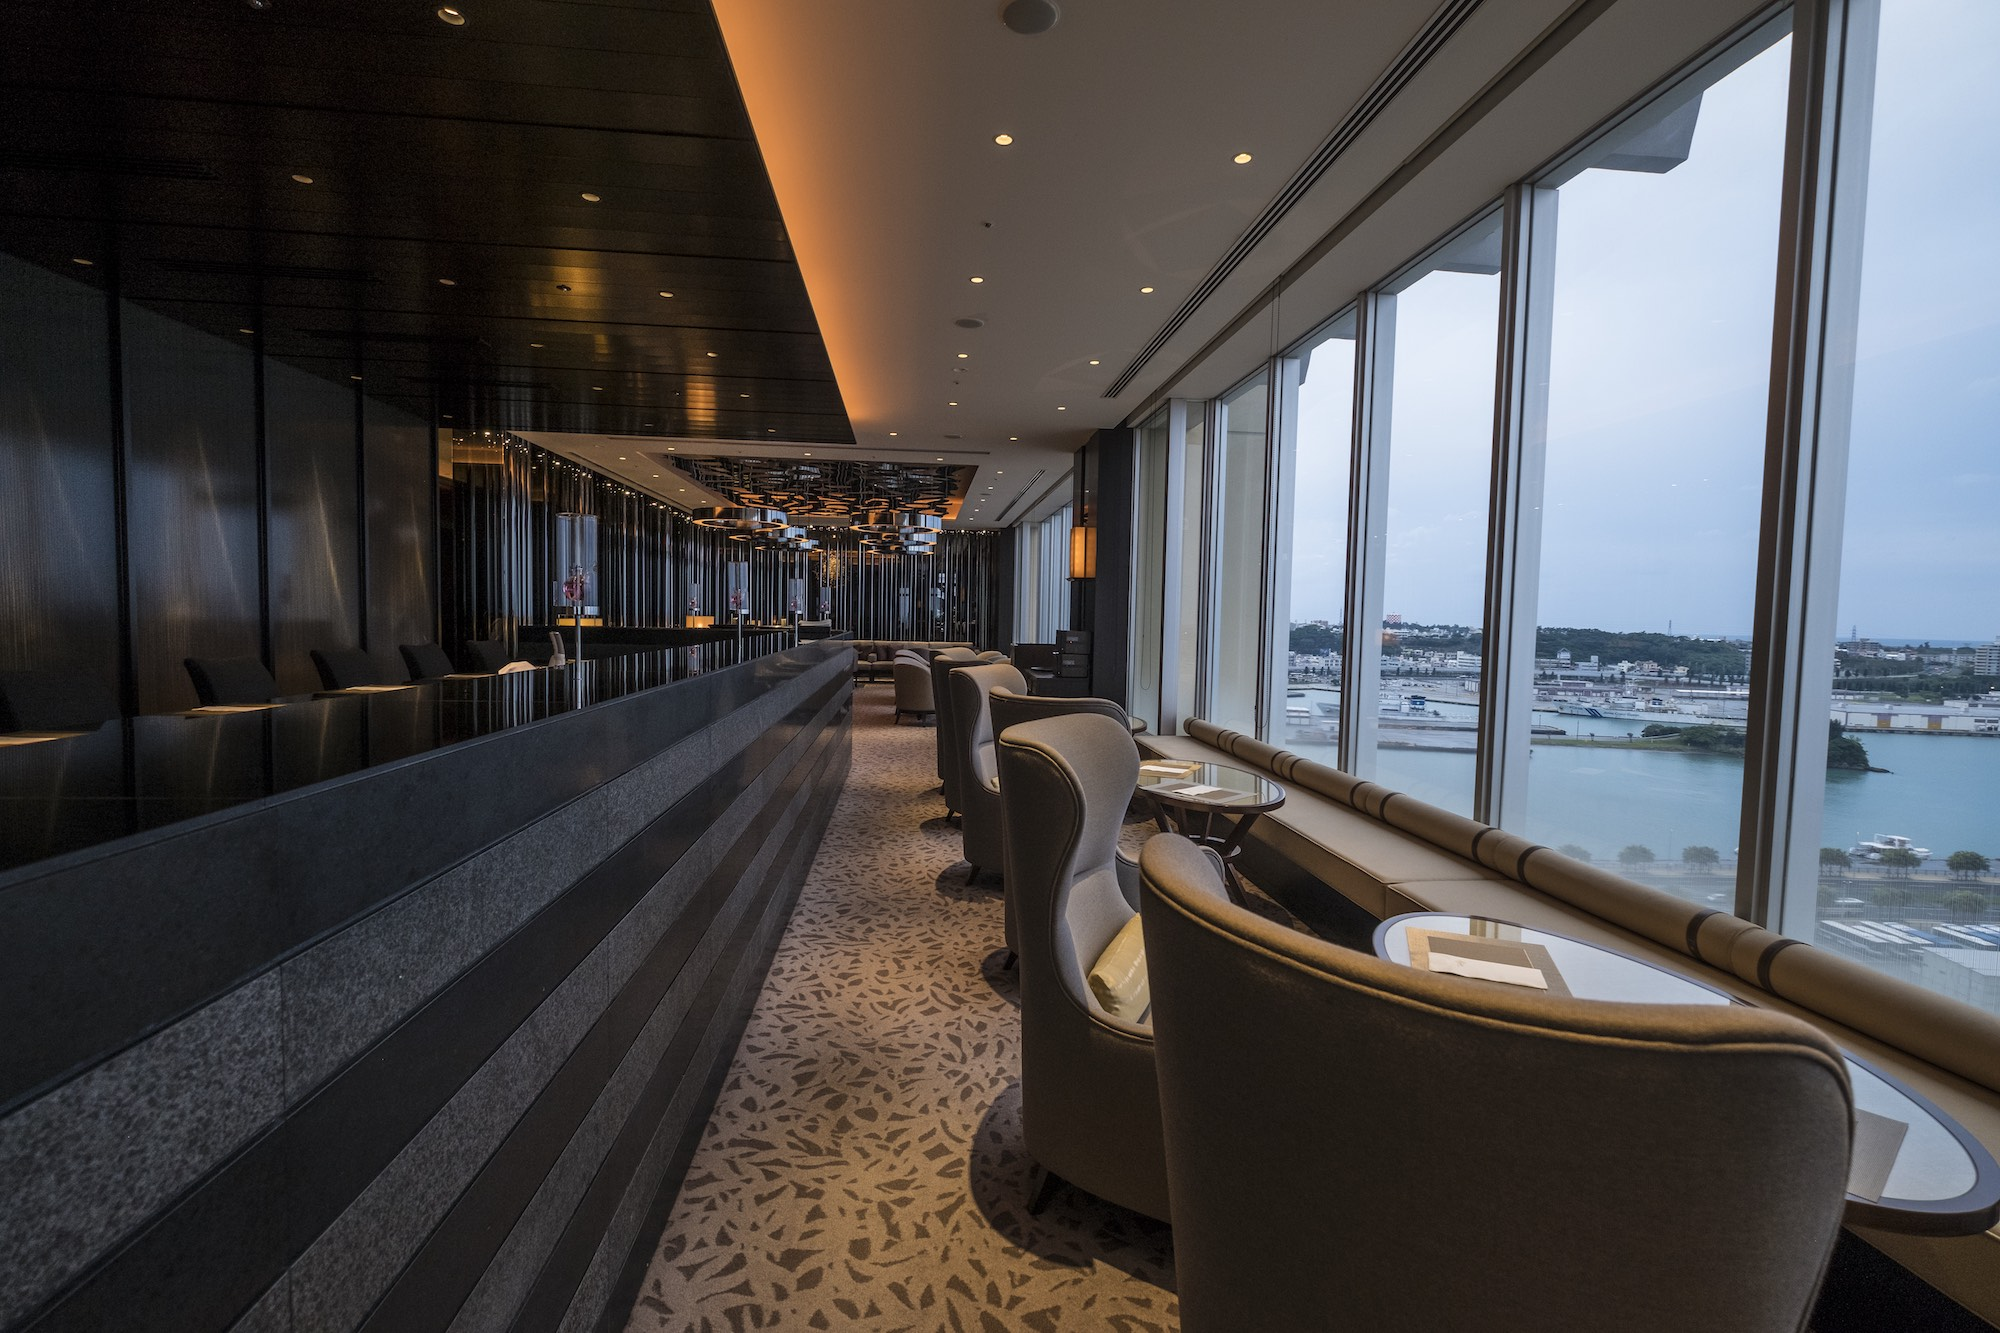 Hospitality restaurant bar hotel Photography services singapore Naha Japan